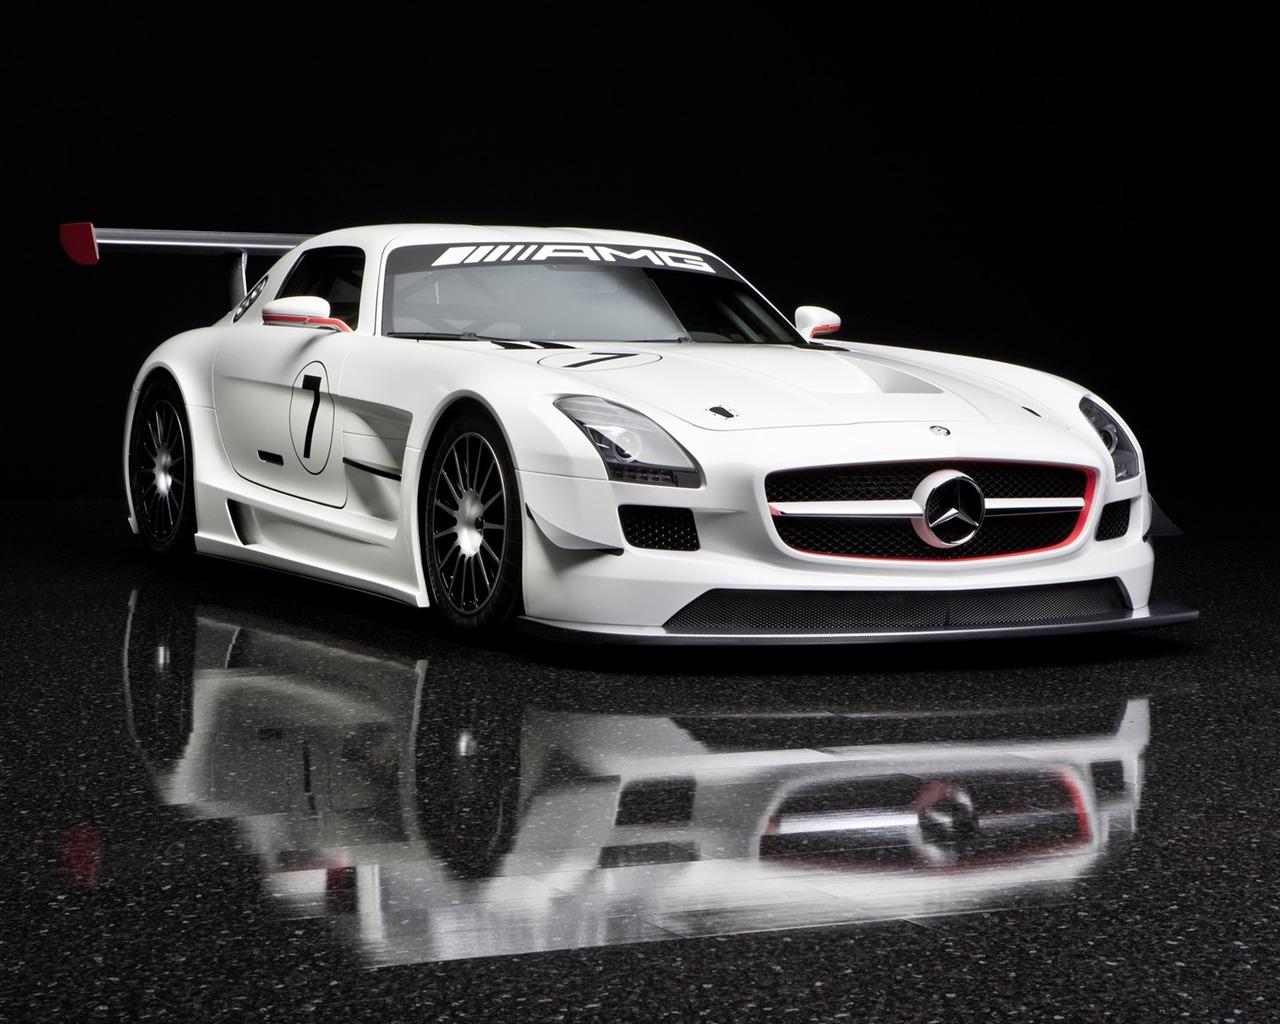 2011年梅赛德斯 奔驰sls amg的gt3 高清图片